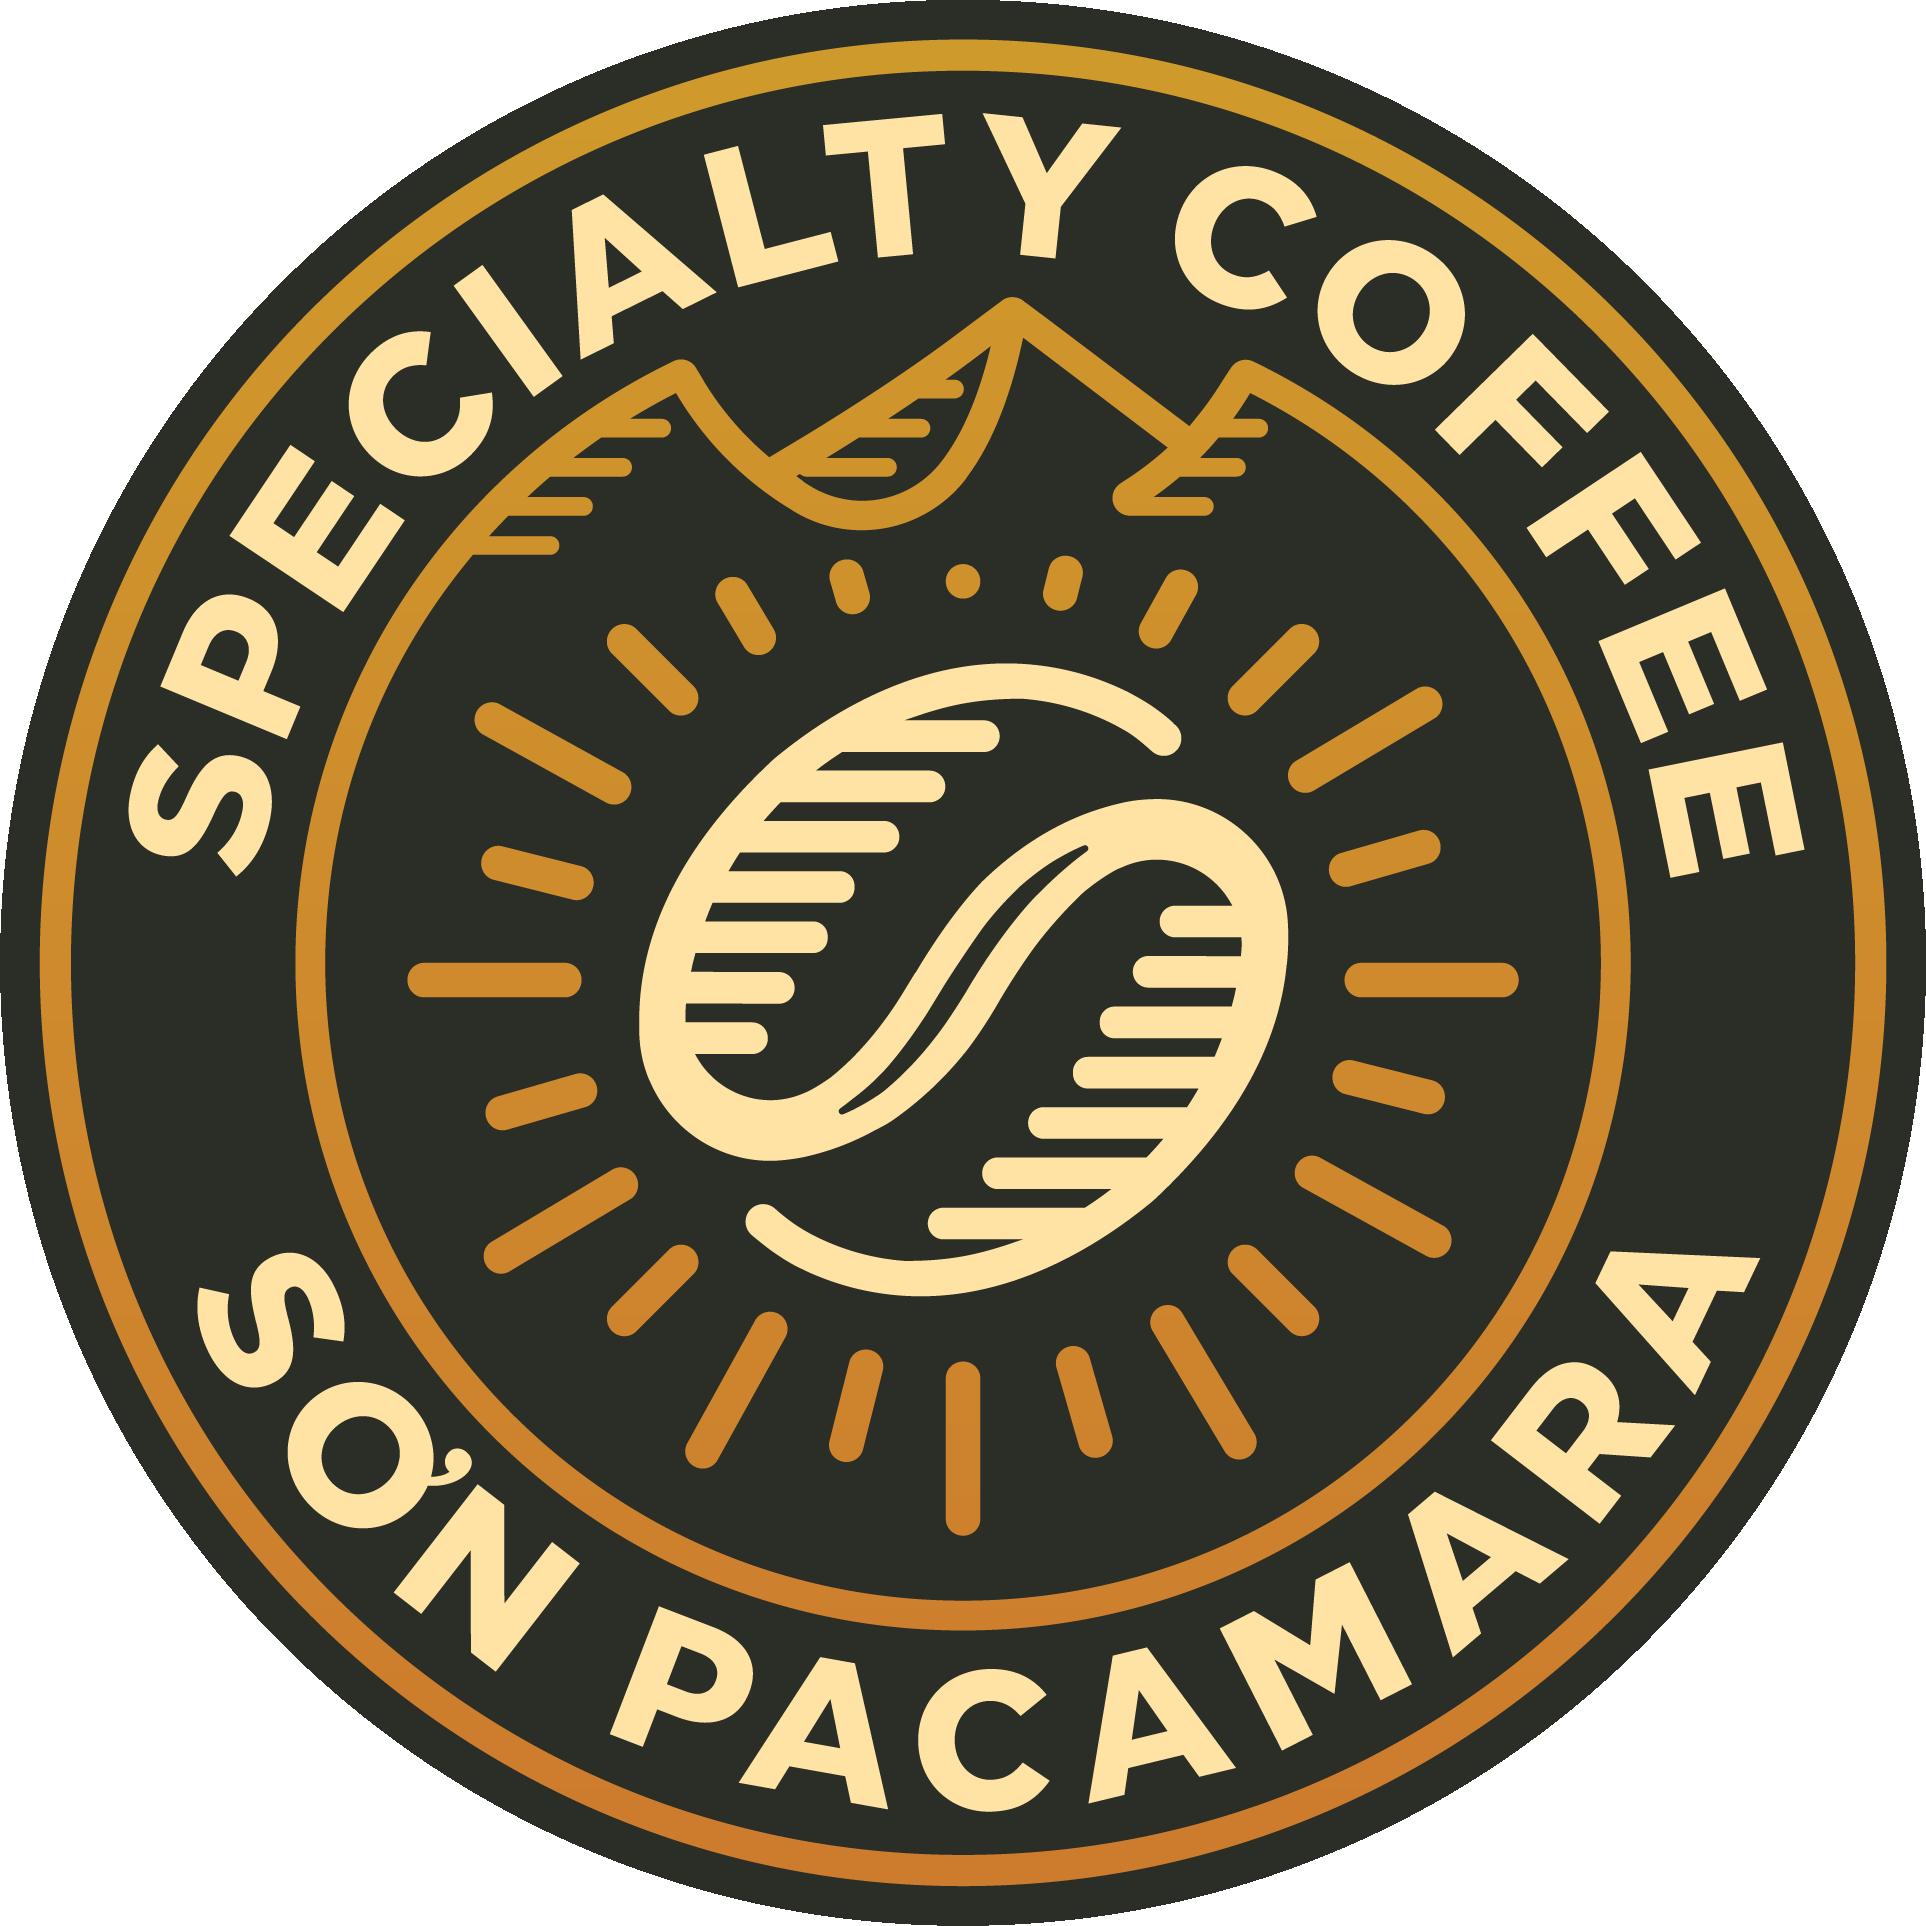 Sơn Pacamara